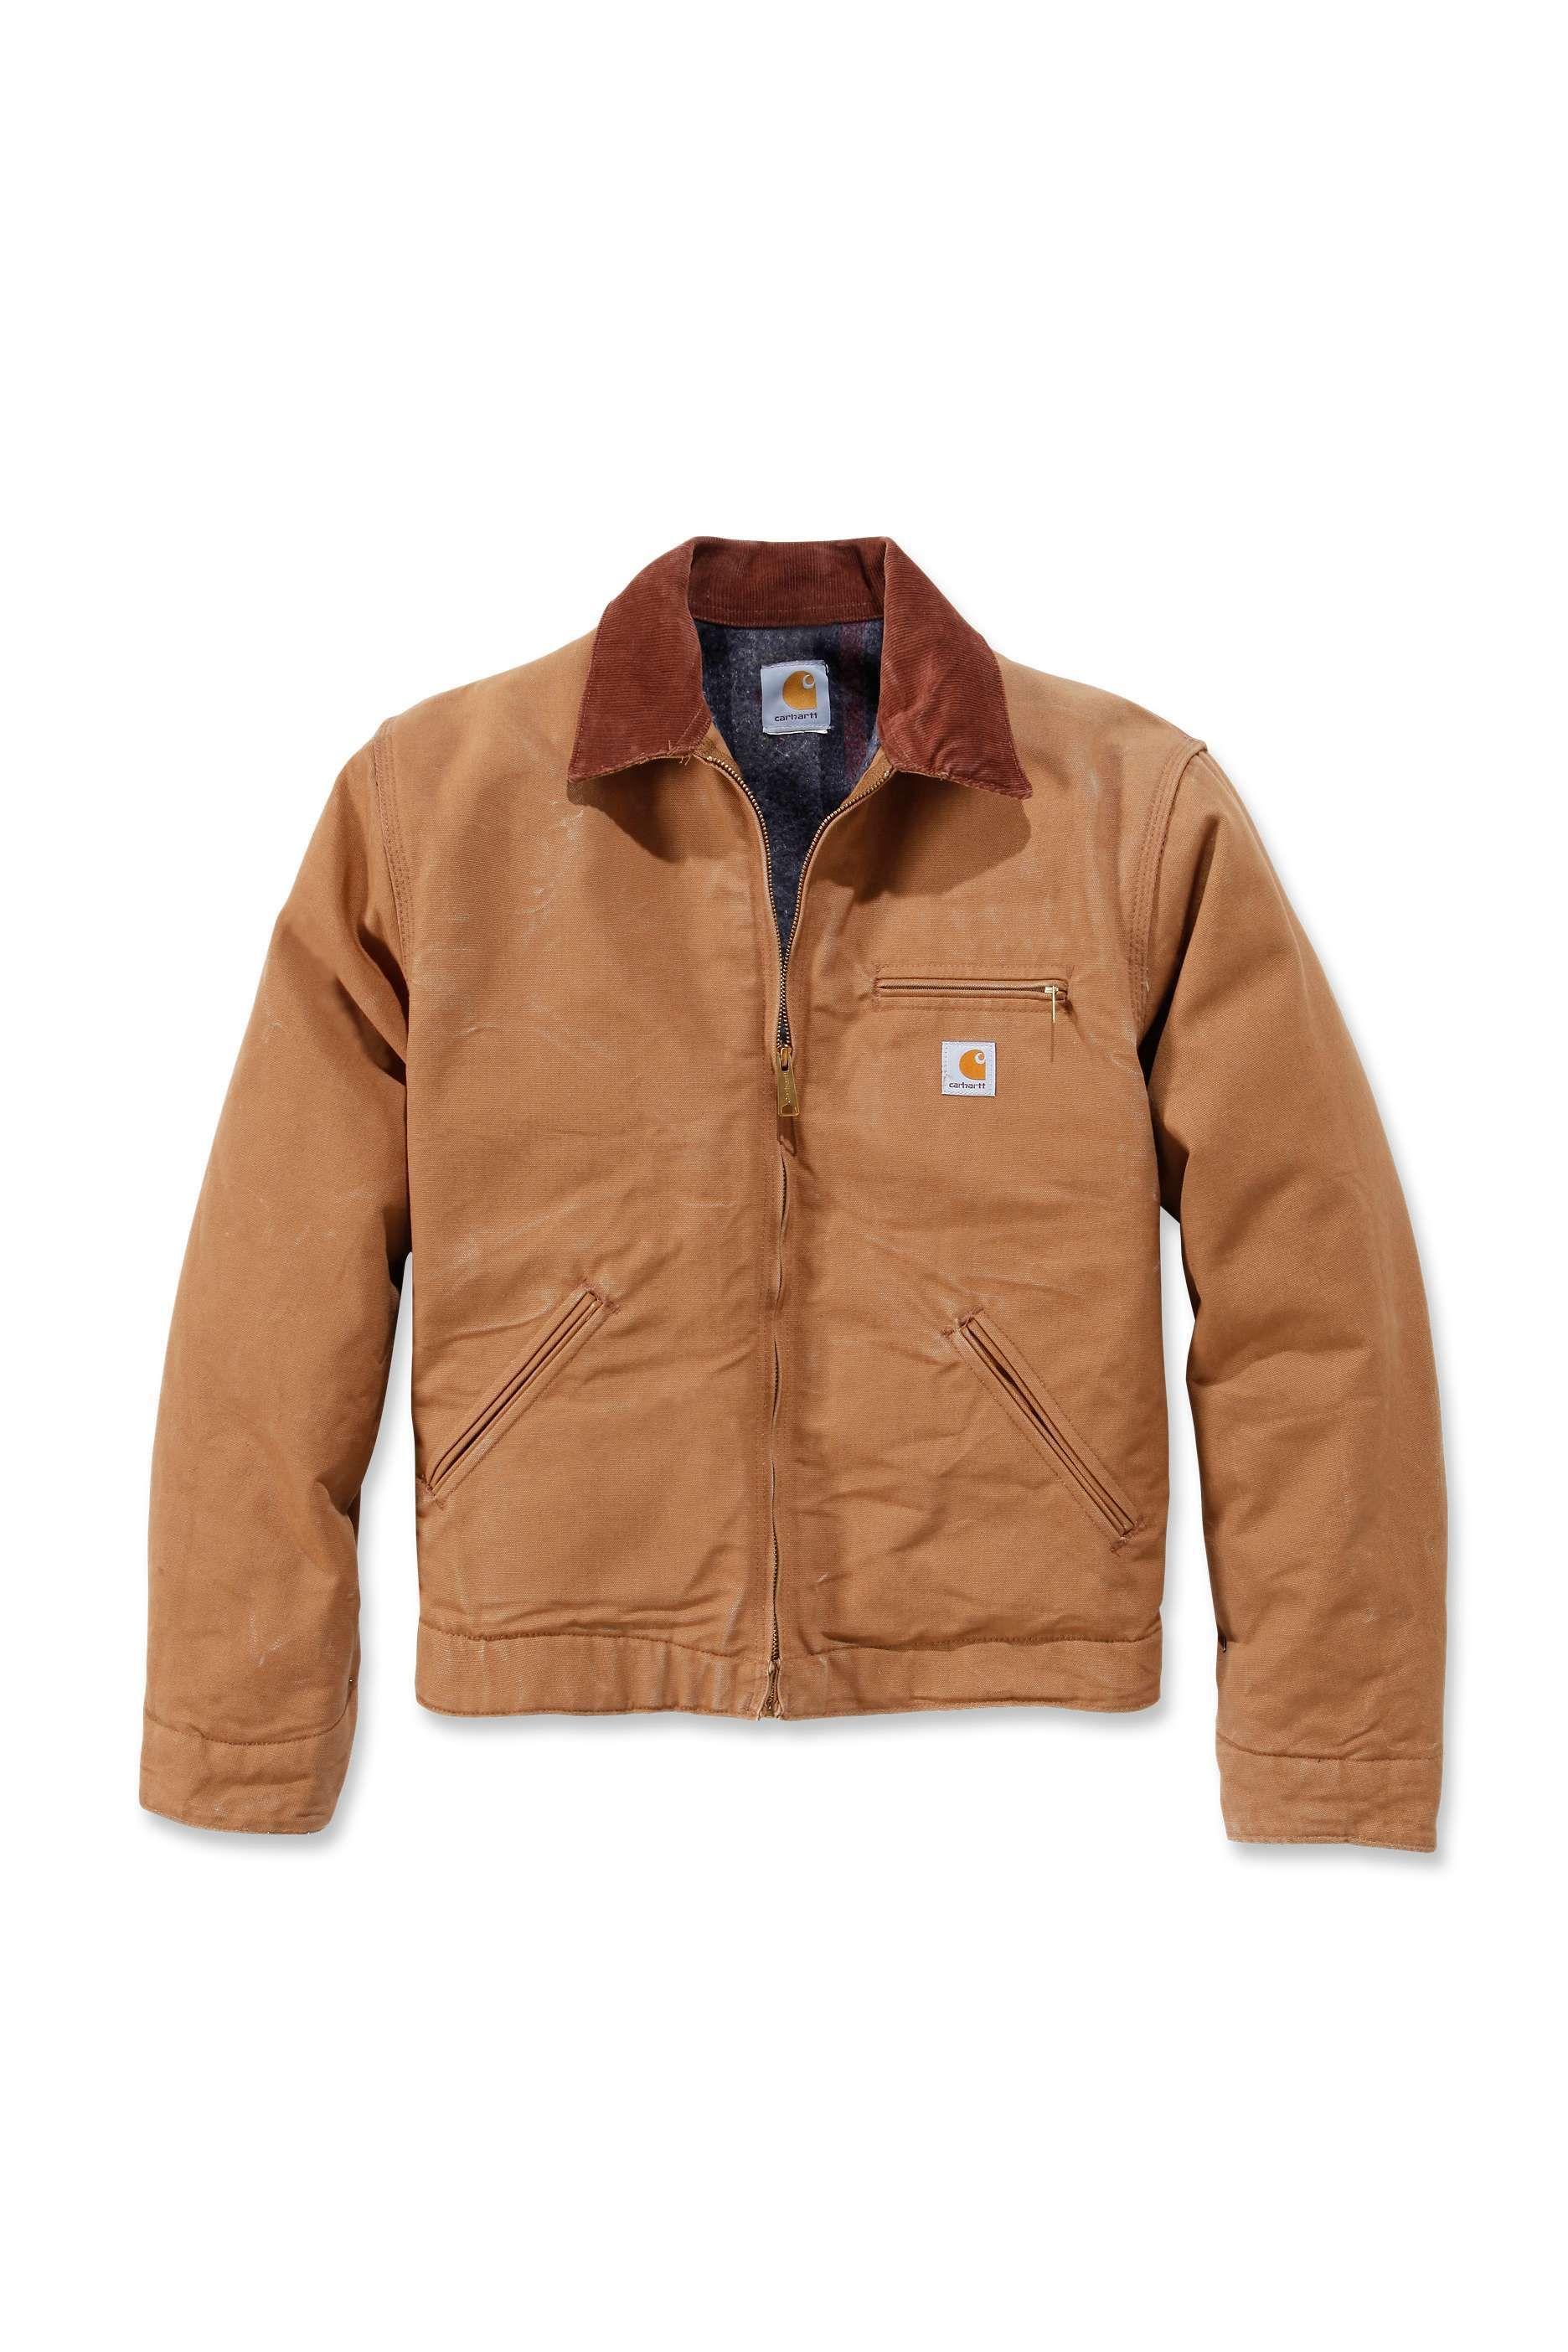 Carhartt Bartlett Jacket Carhartt Detroit Jacket Carhartt Workwear Carhartt Jacket [ 2808 x 1872 Pixel ]